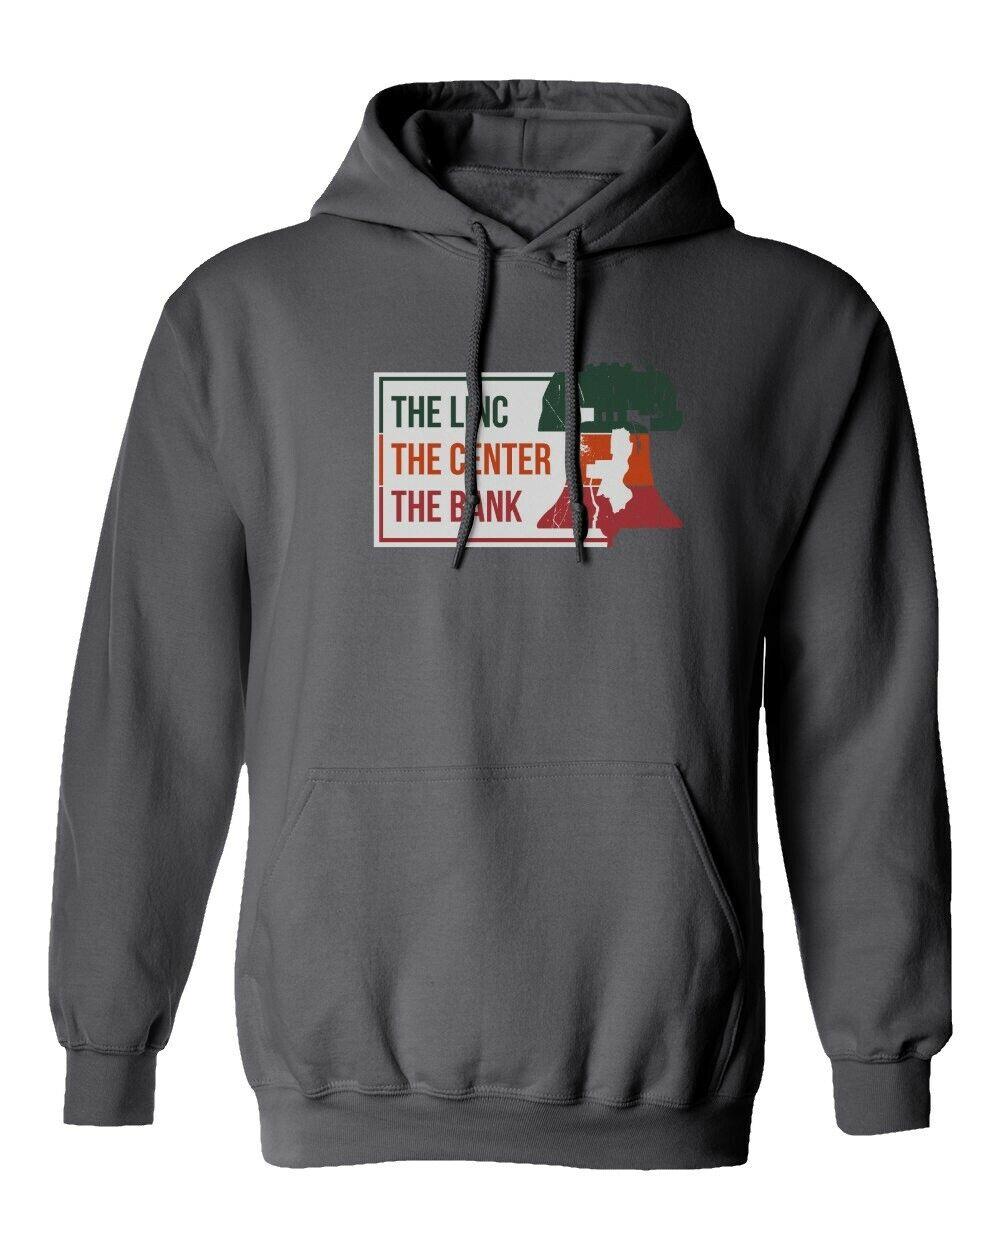 Philadelphia Eagles Flyers Phillies Stadium Men's Hooded Sweatshirt